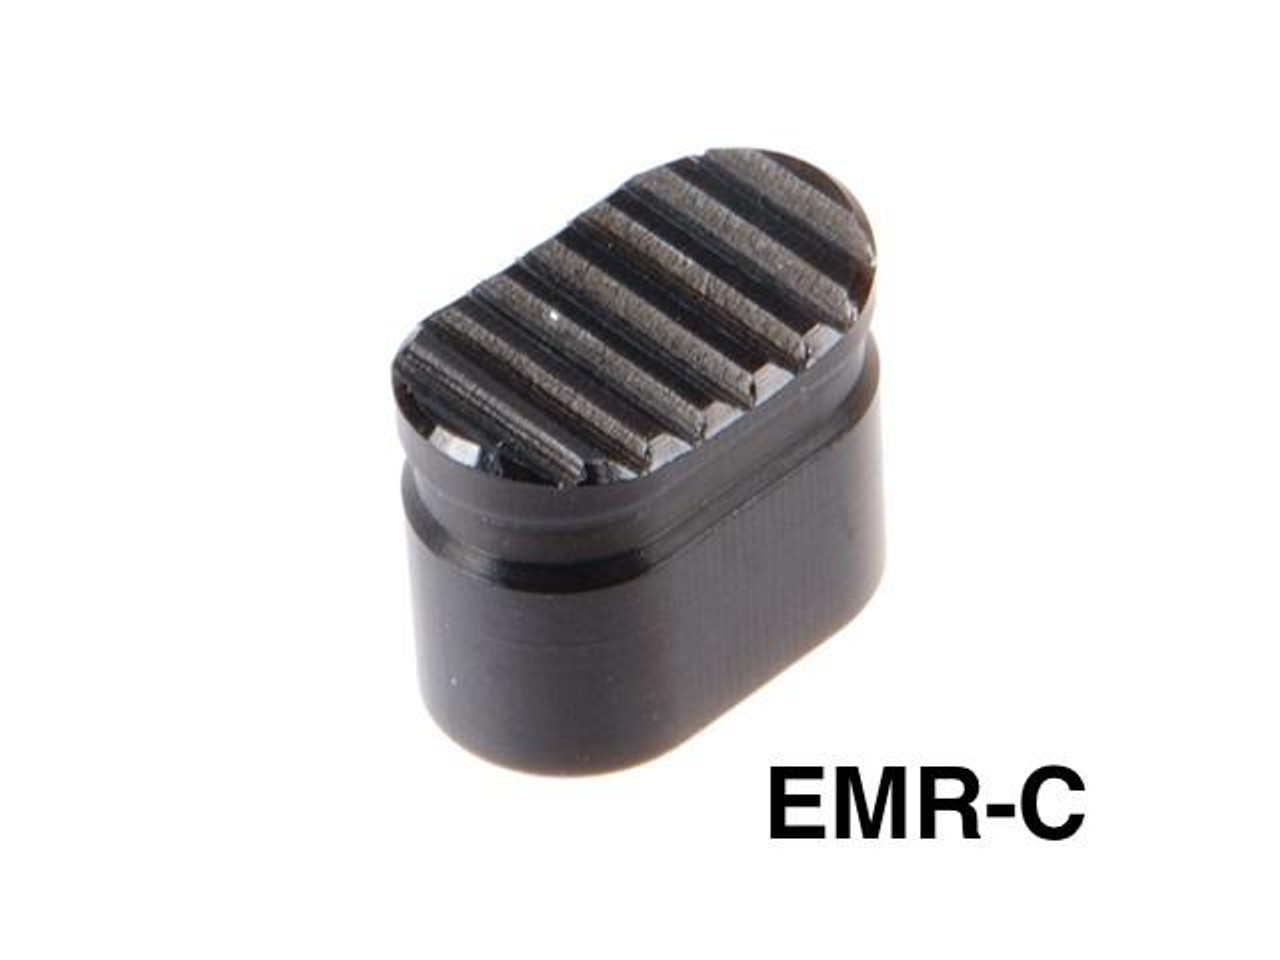 Forward Controls Design Enhanced Magazine Release - EMR-C